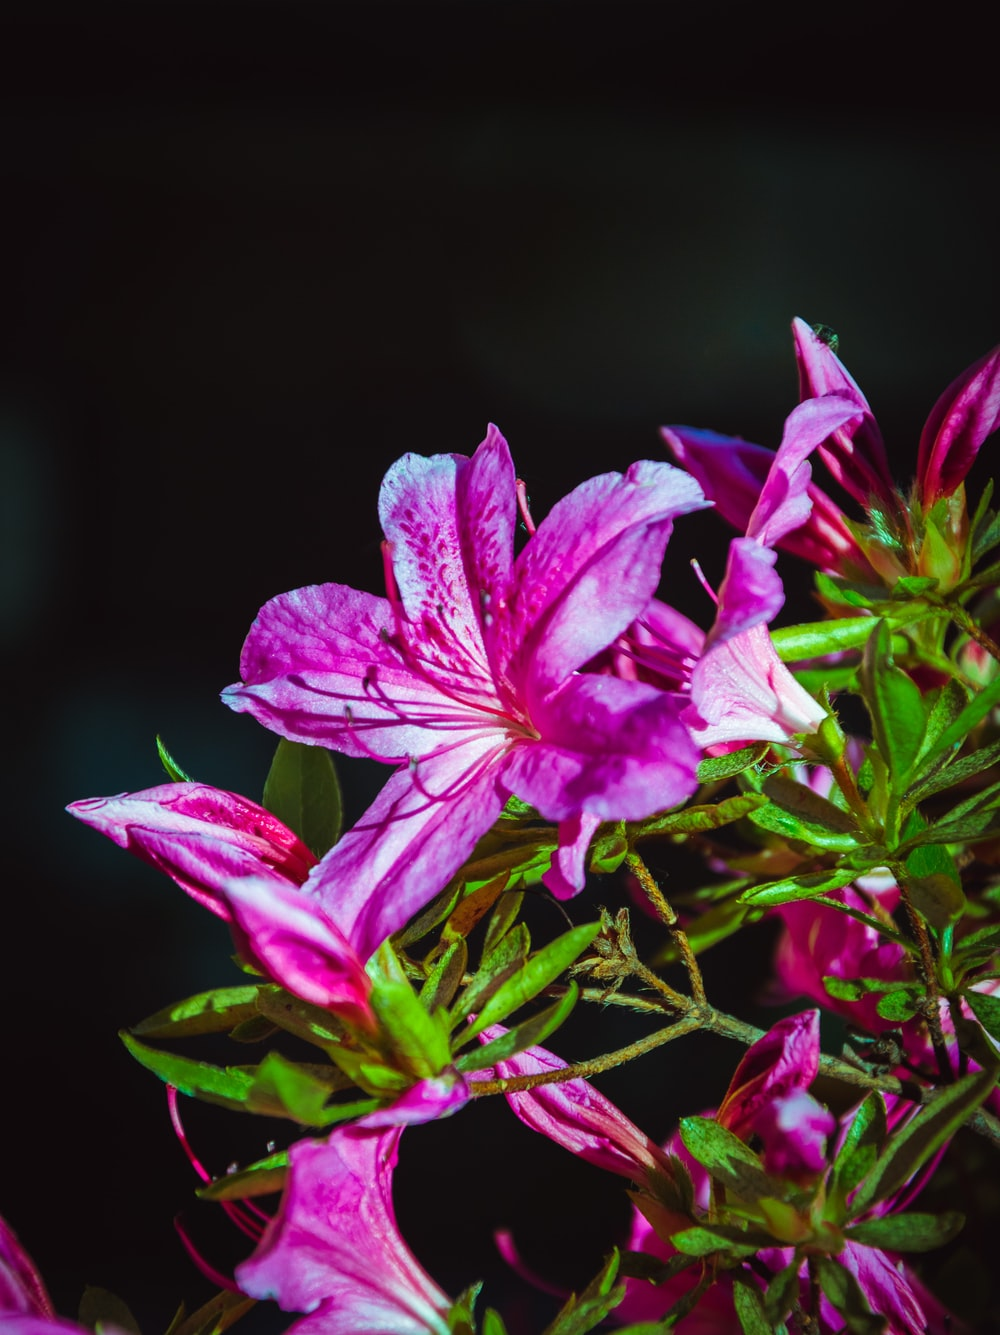 purple flower in black background